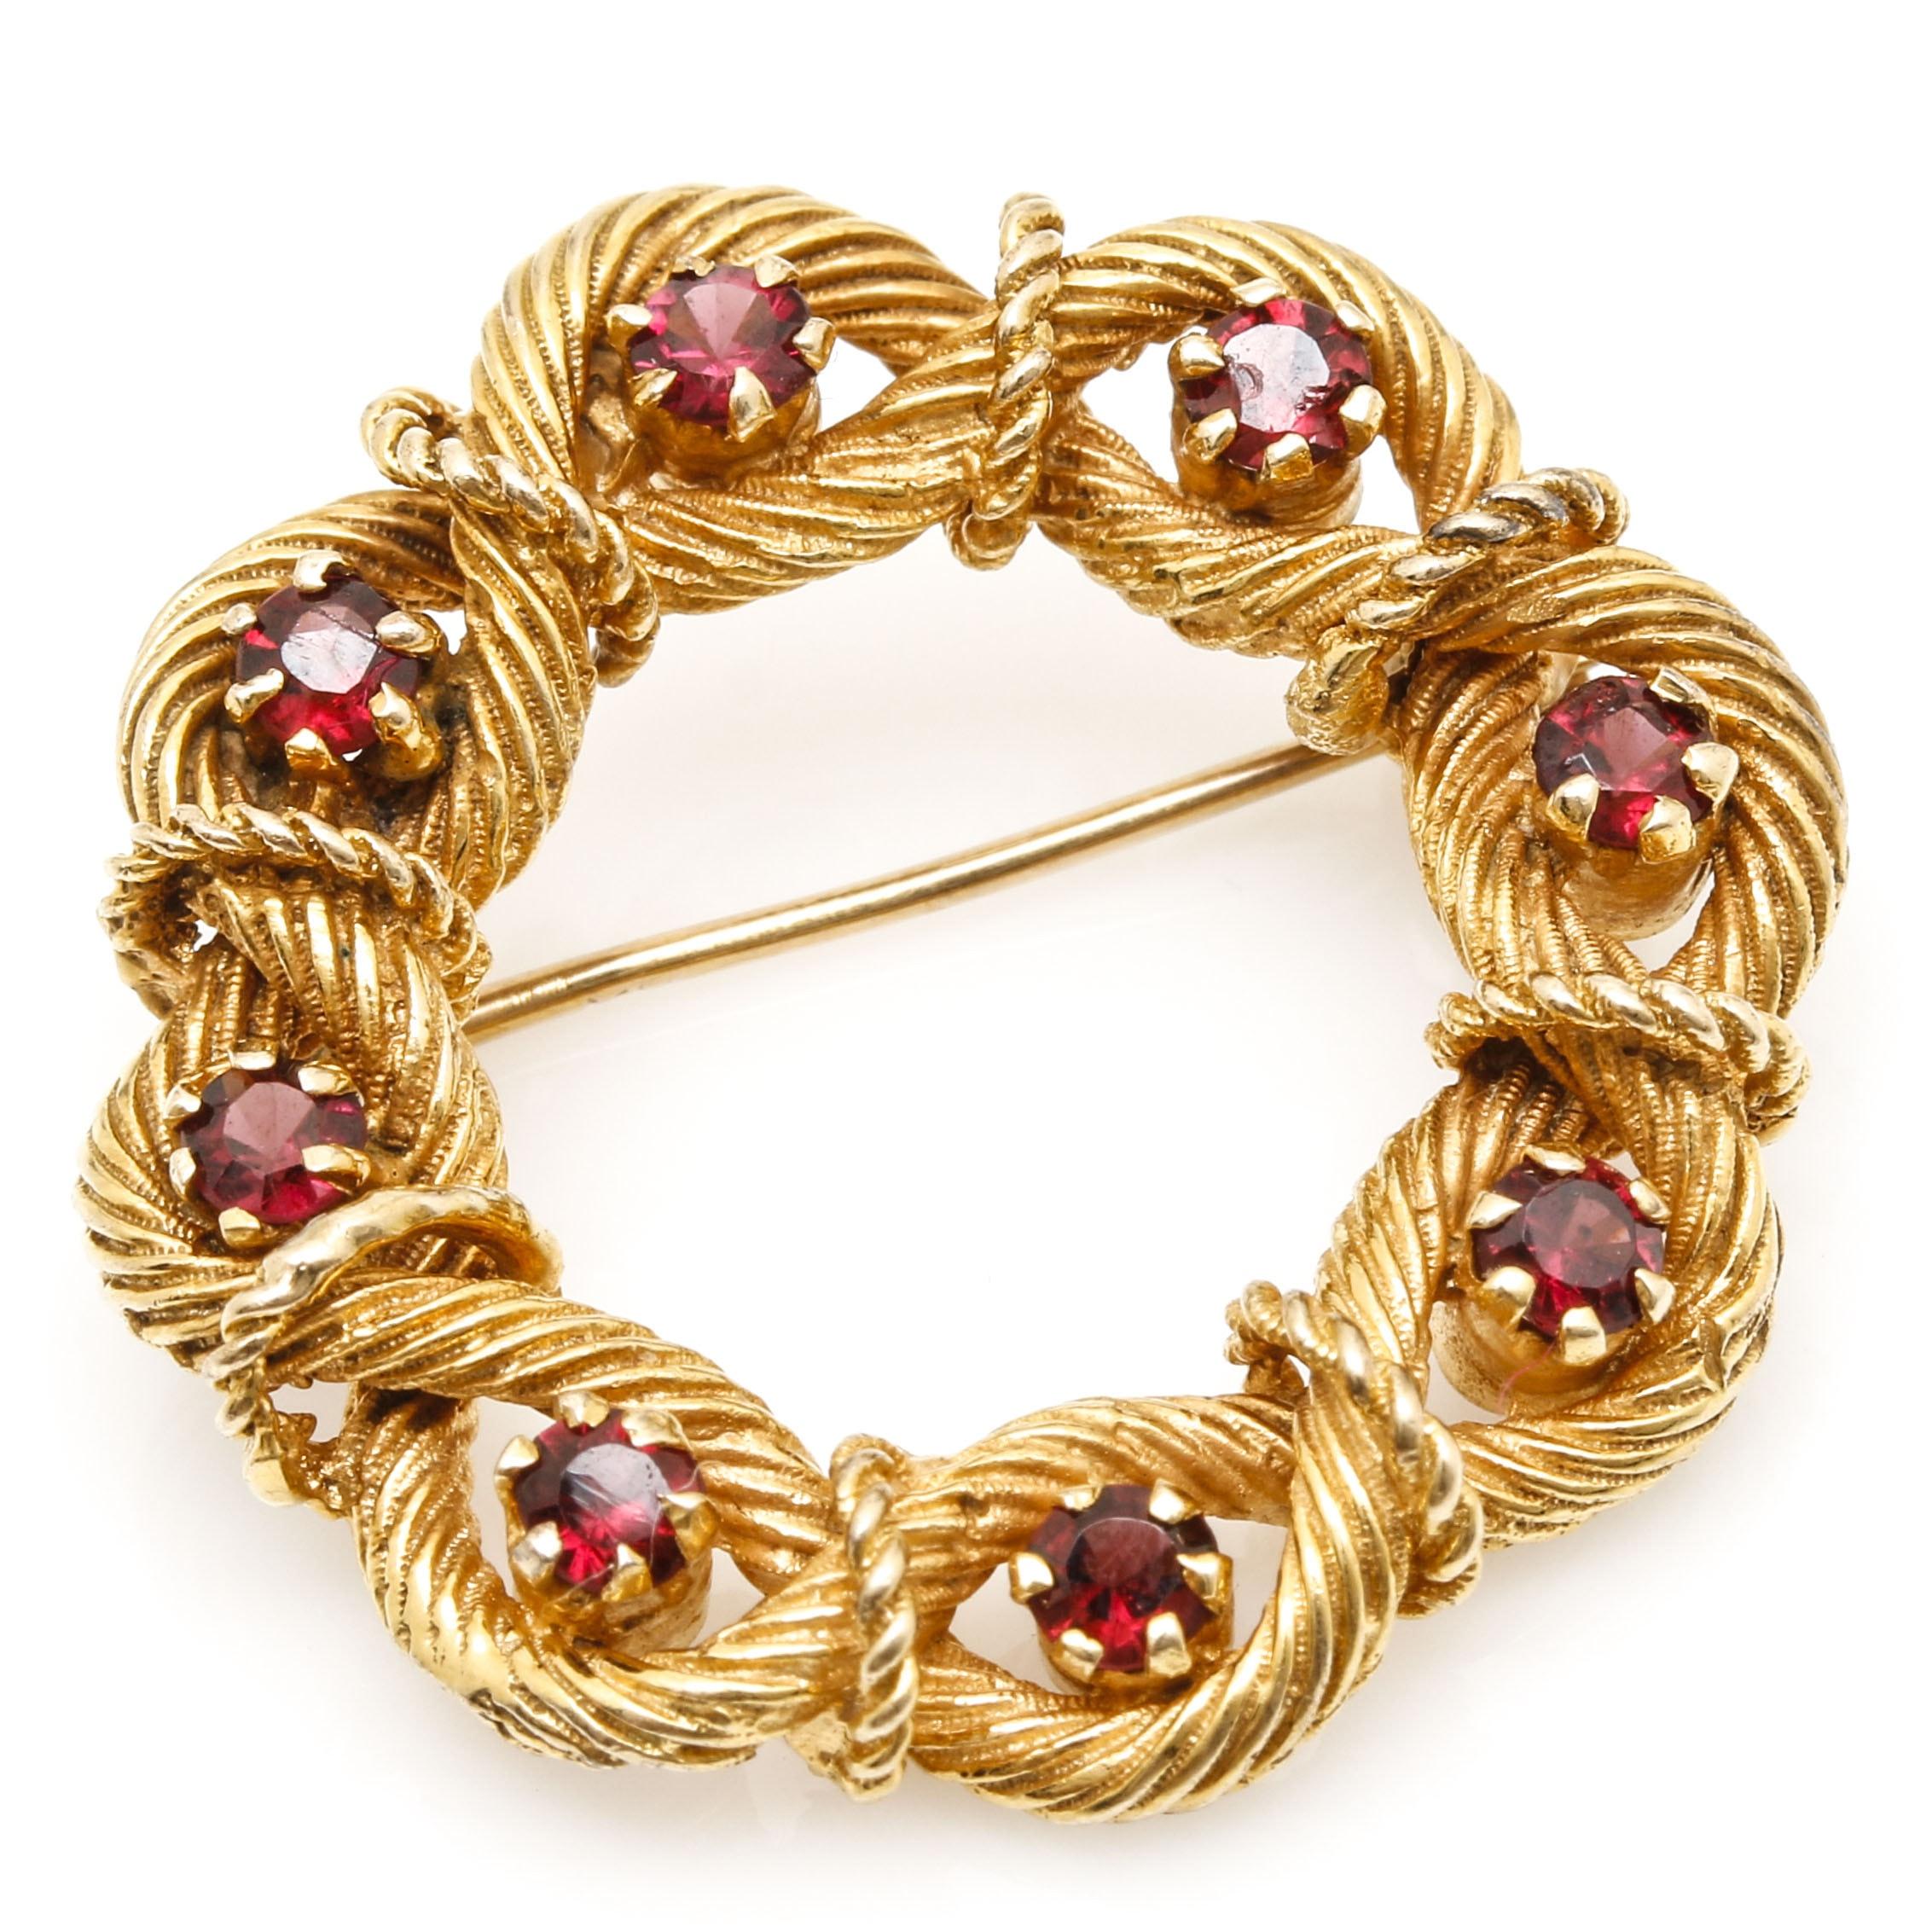 14K Yellow Gold Wreath Brooch with Garnet Gemstones